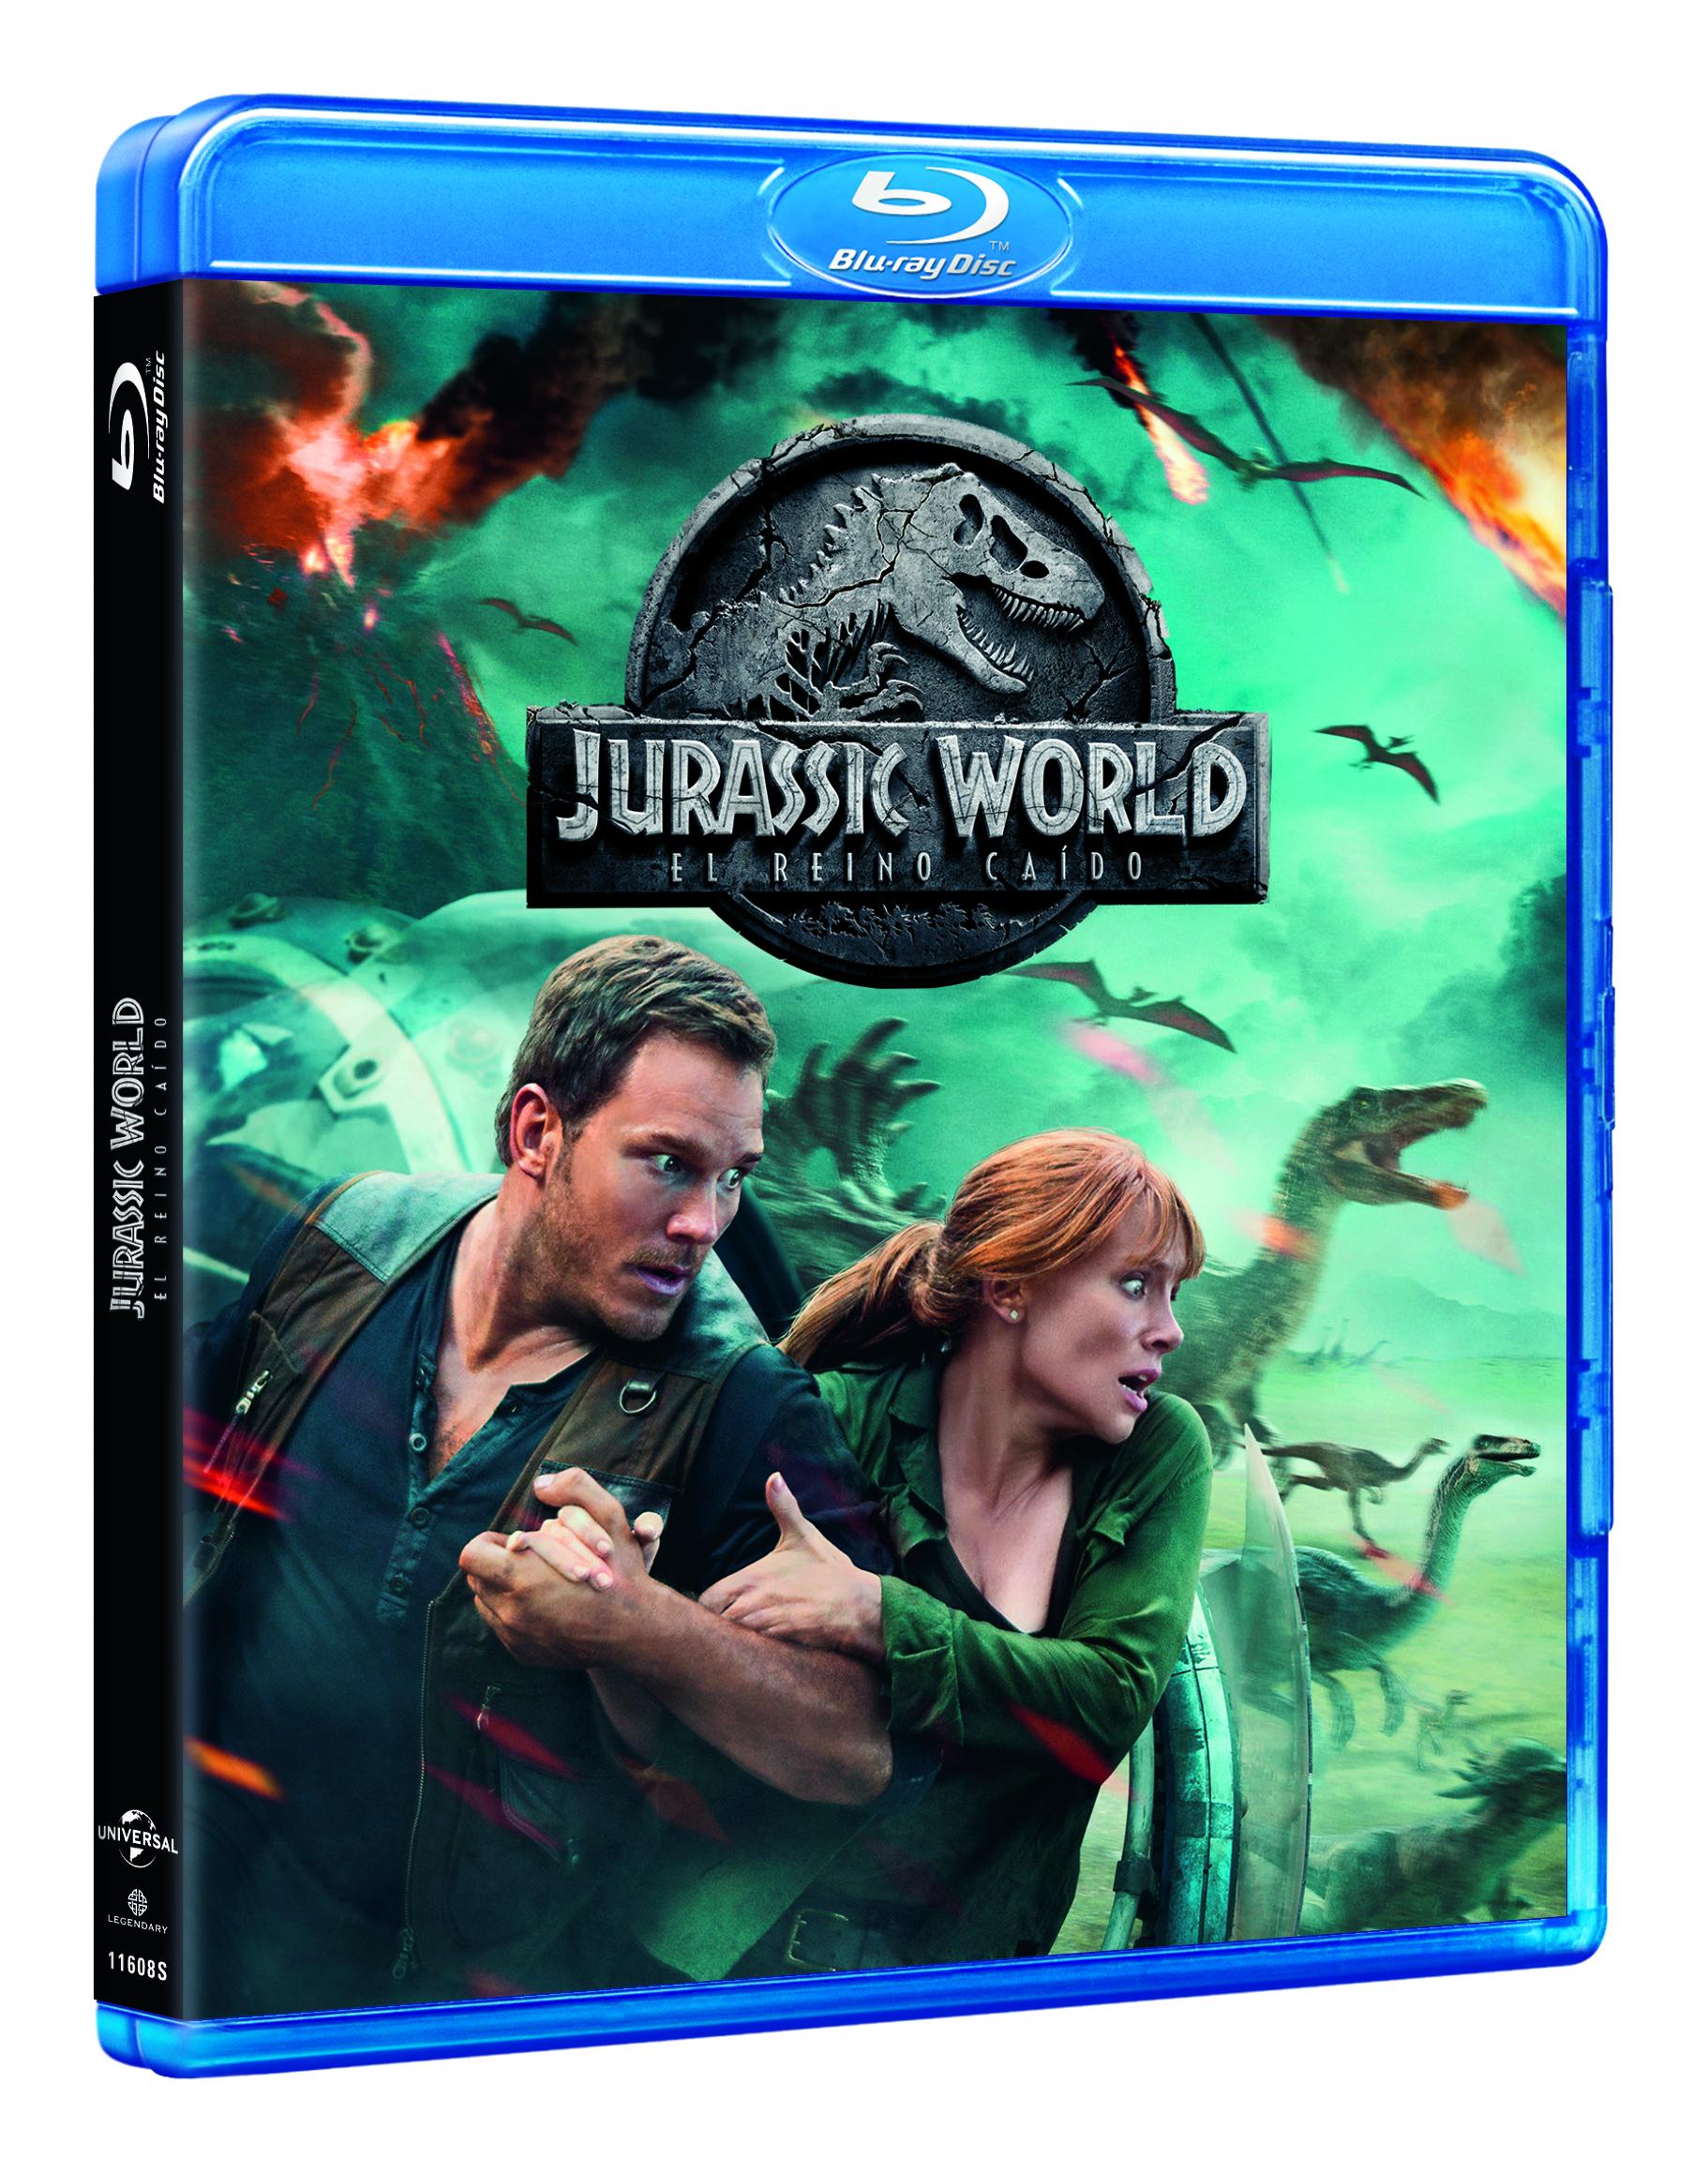 Jurassic World: El Reino Caído Blu-ray